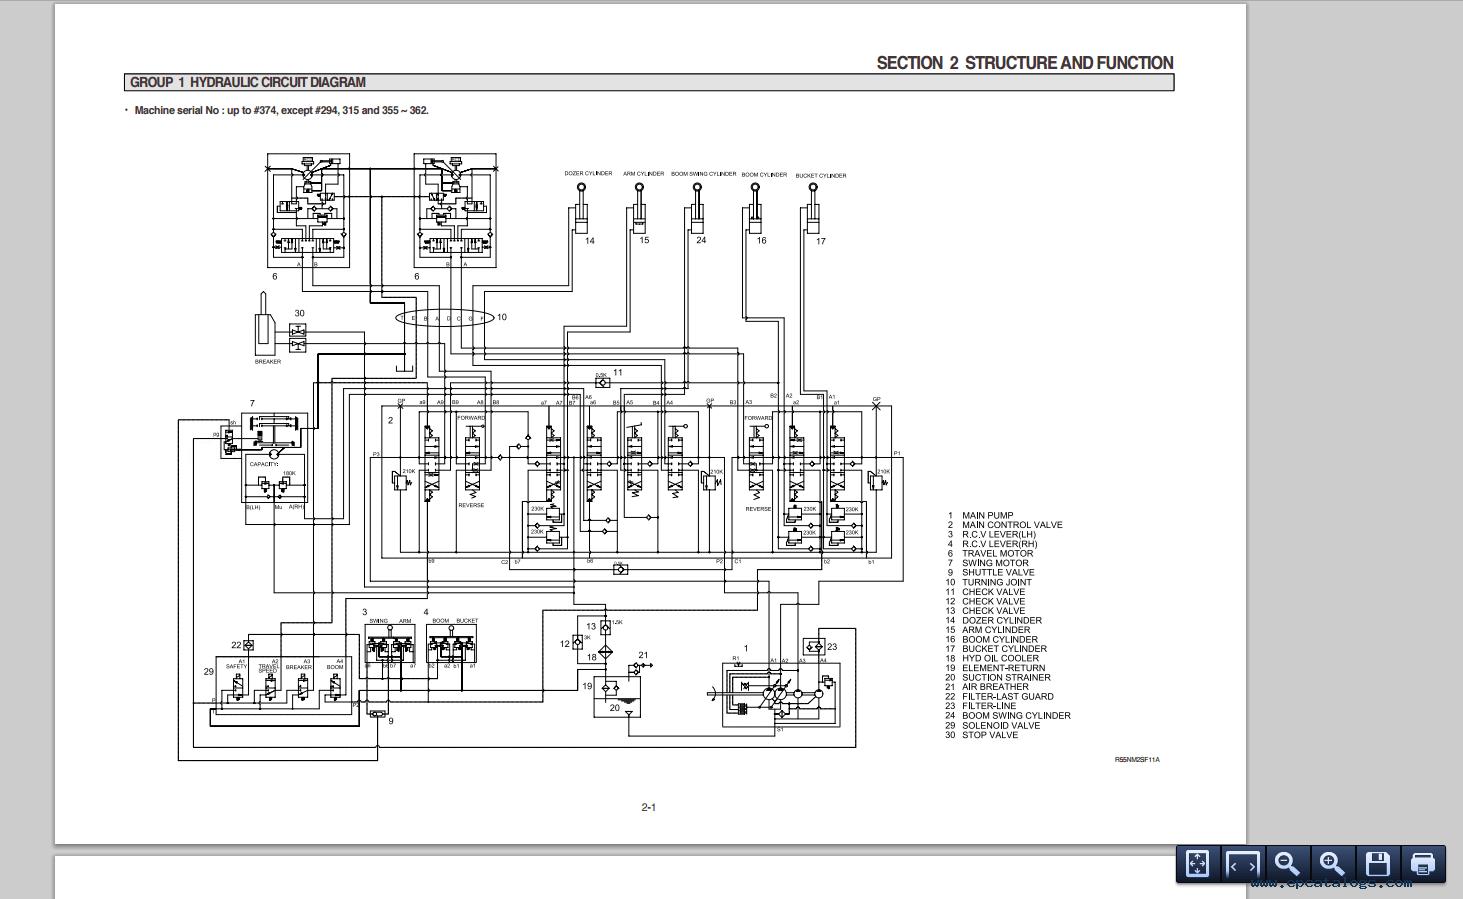 wiring diagram qsm11 system sensor smoke detector hyundai ceres 2014 service manual download